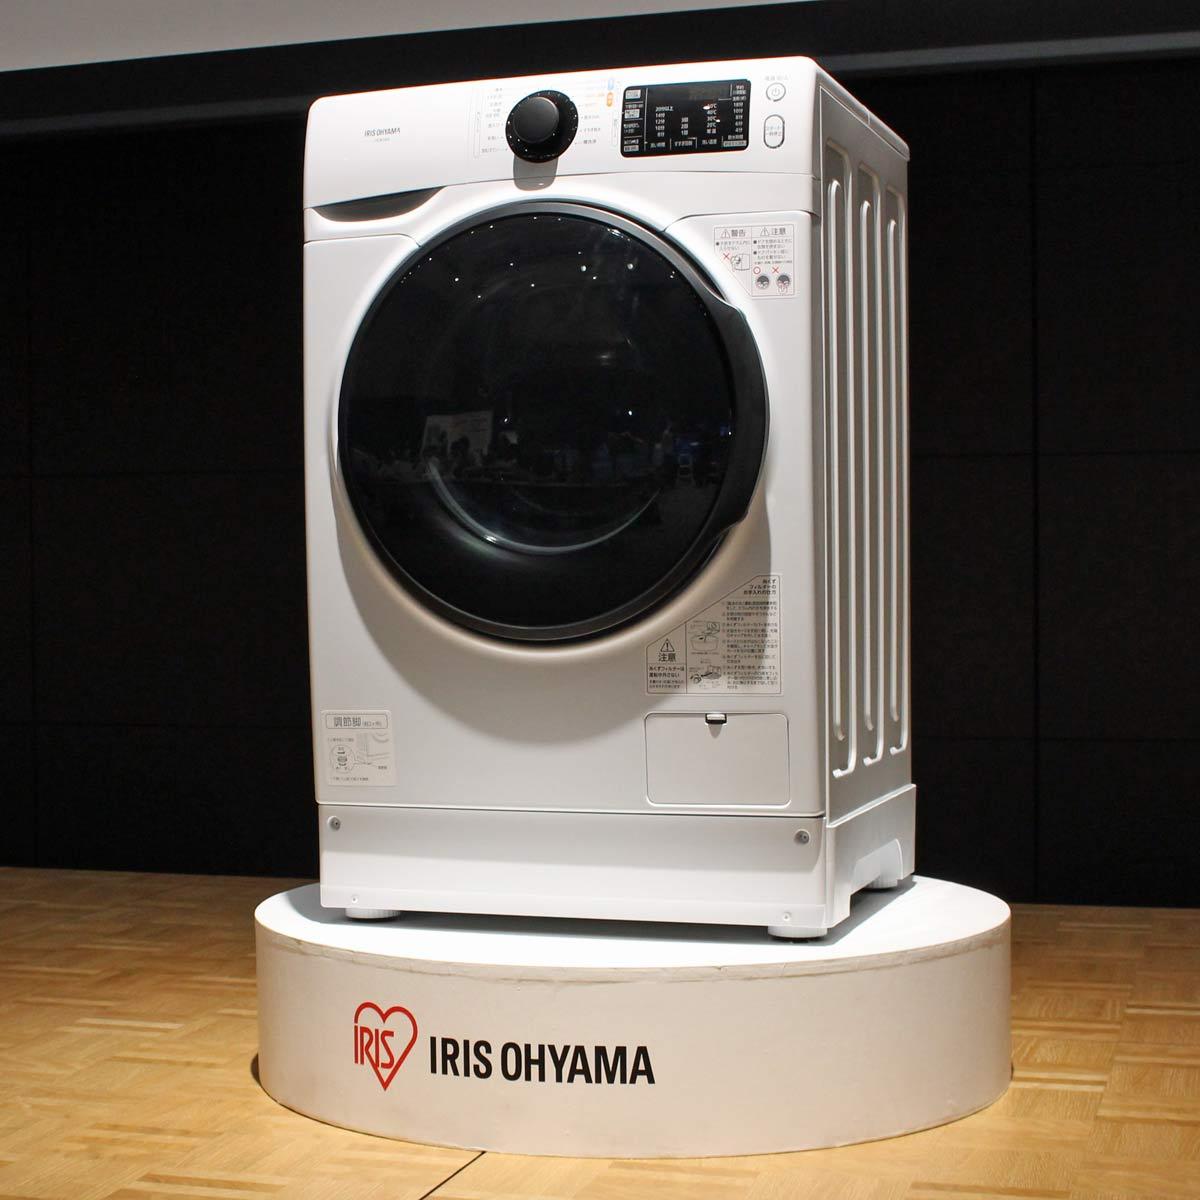 Ag+除菌システム搭載! 部屋干しのニオイを抑えるアイリスオーヤマのドラム式洗濯機